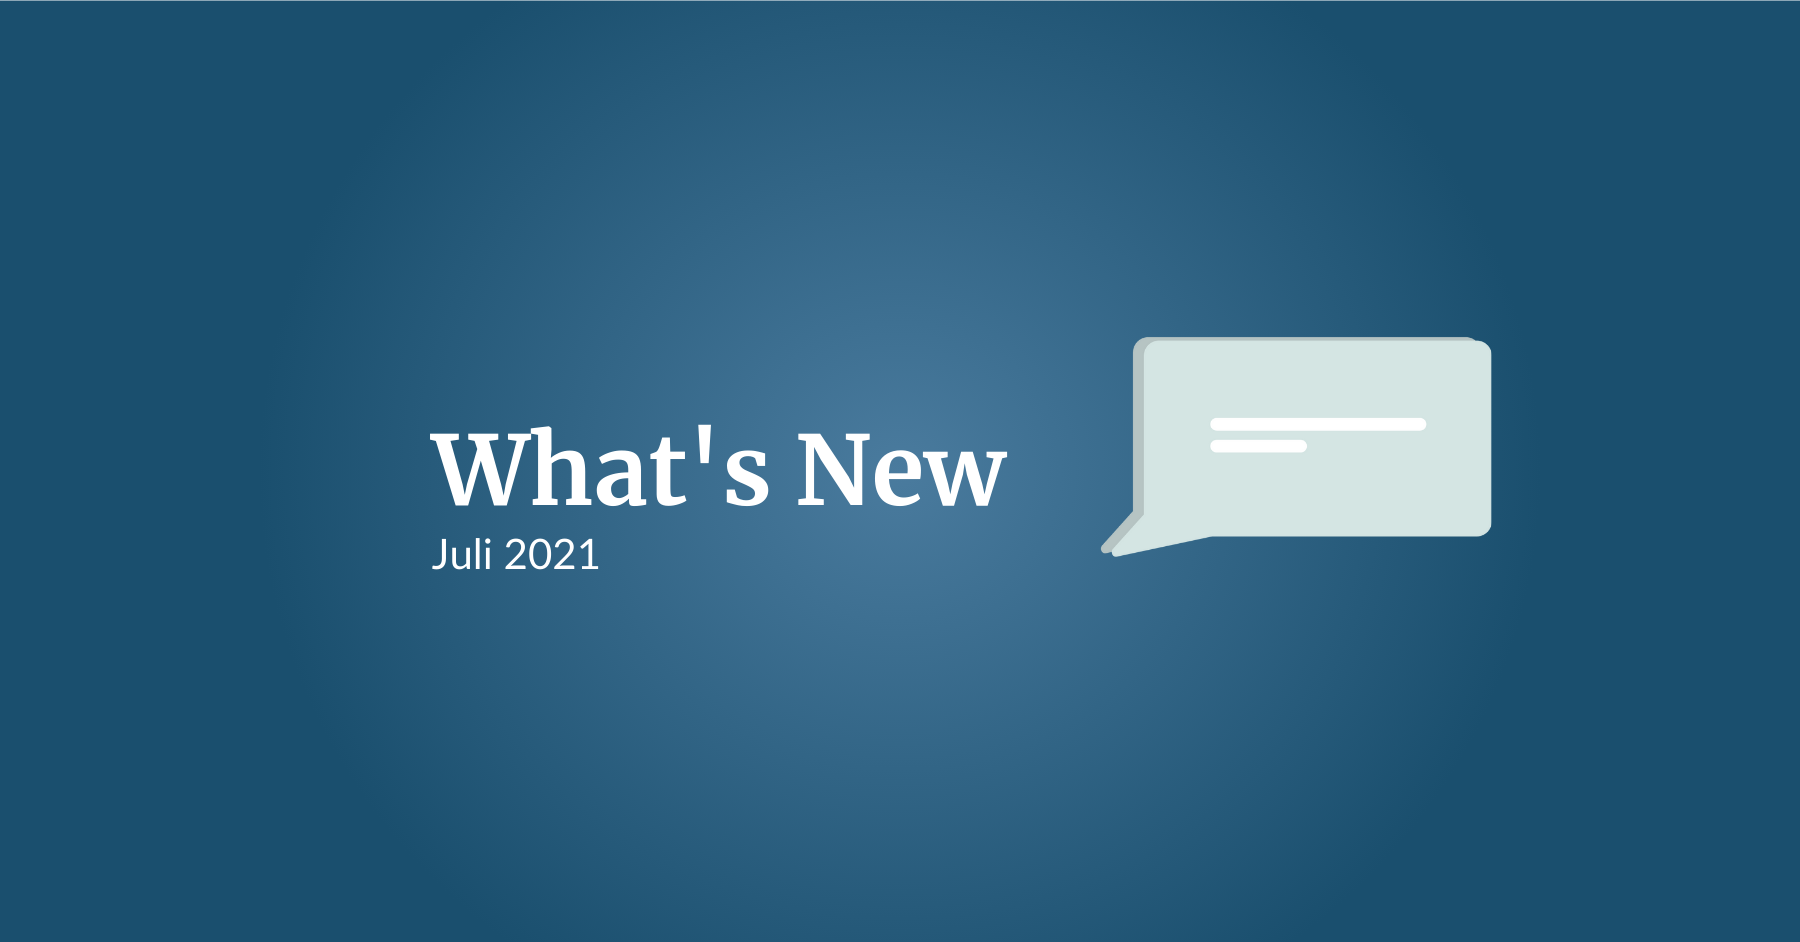 What's New: Juli 2021